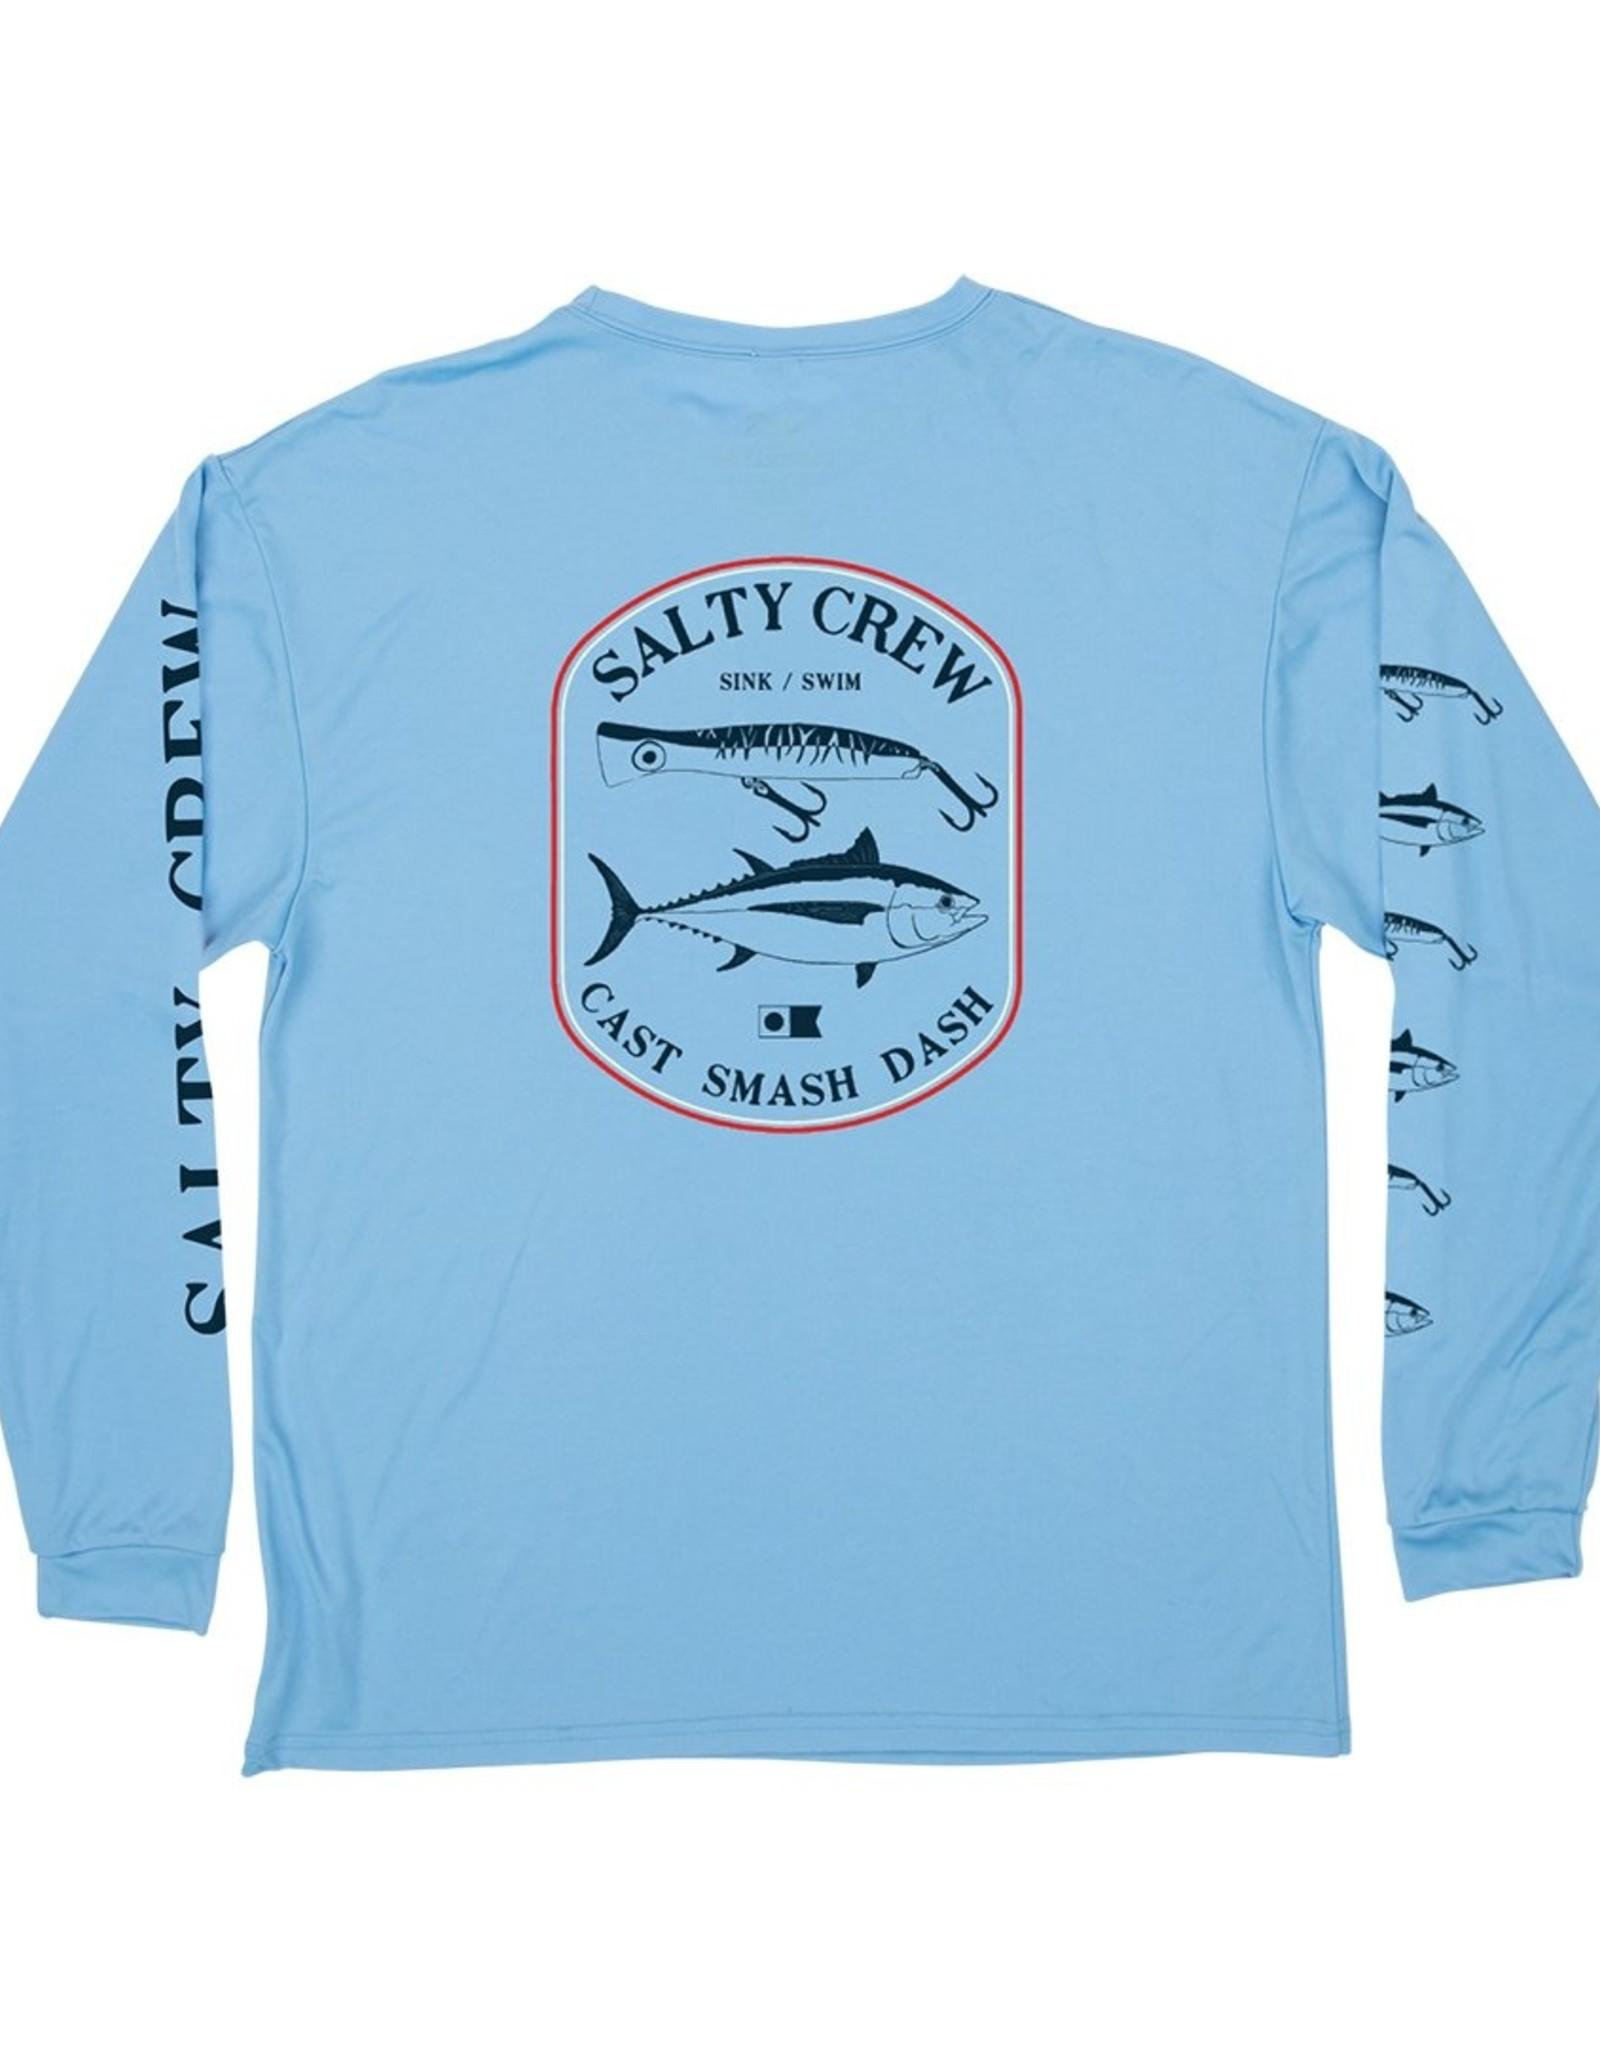 Salty Crew Surface Rashguard